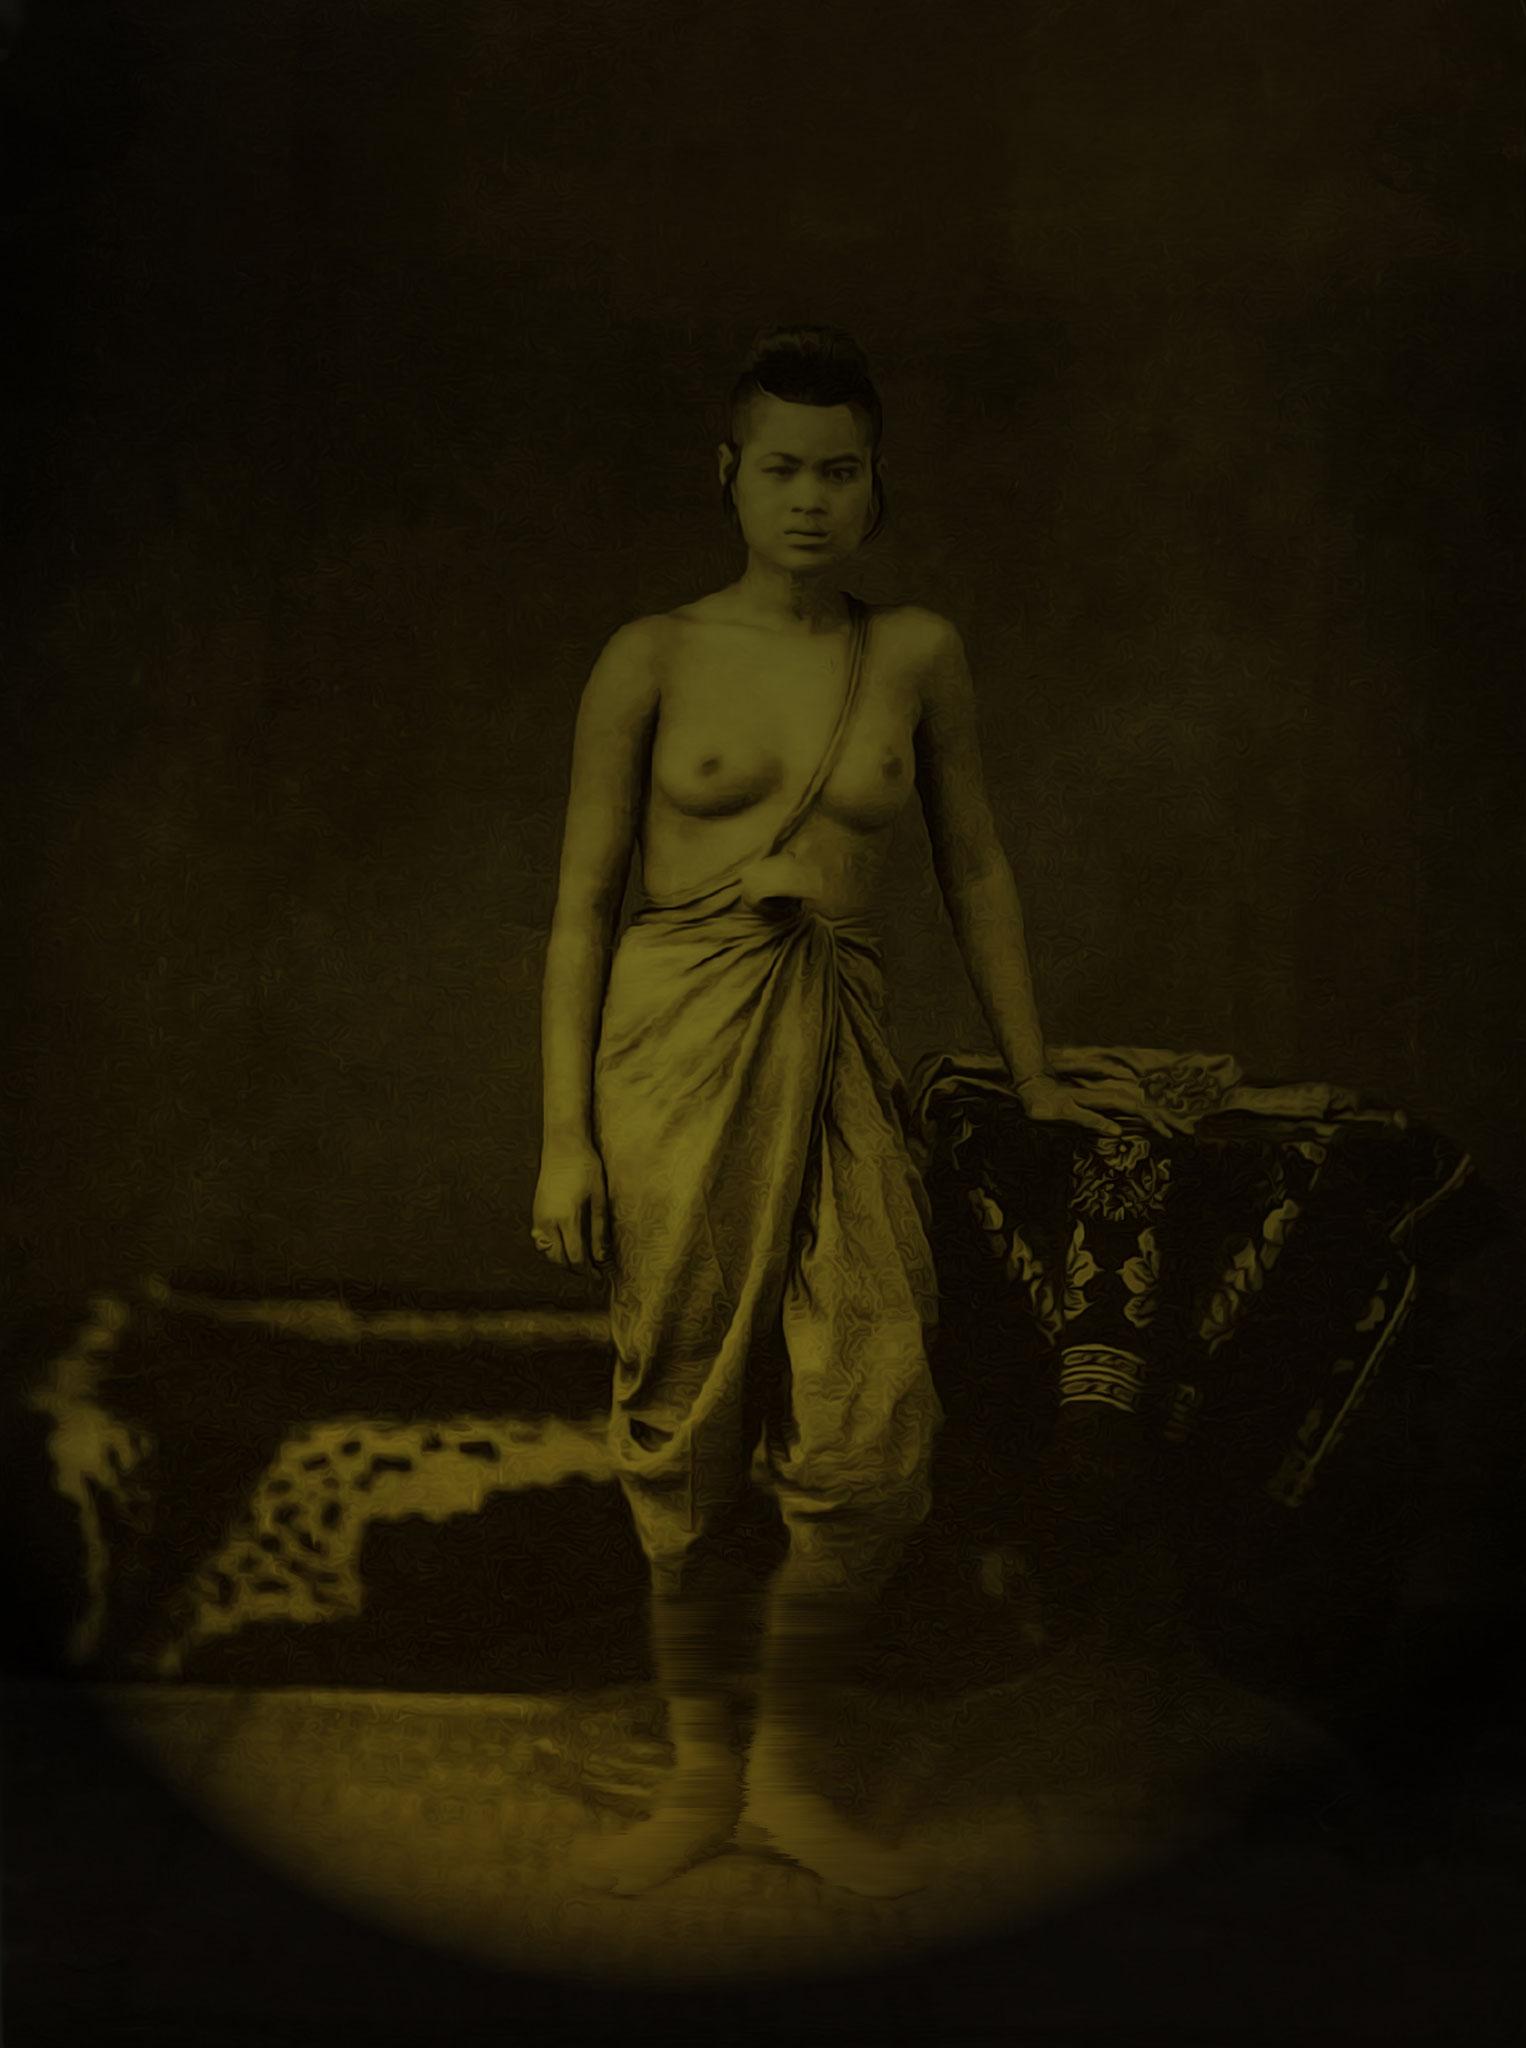 Portrait of the famous Siam Warrior half nude